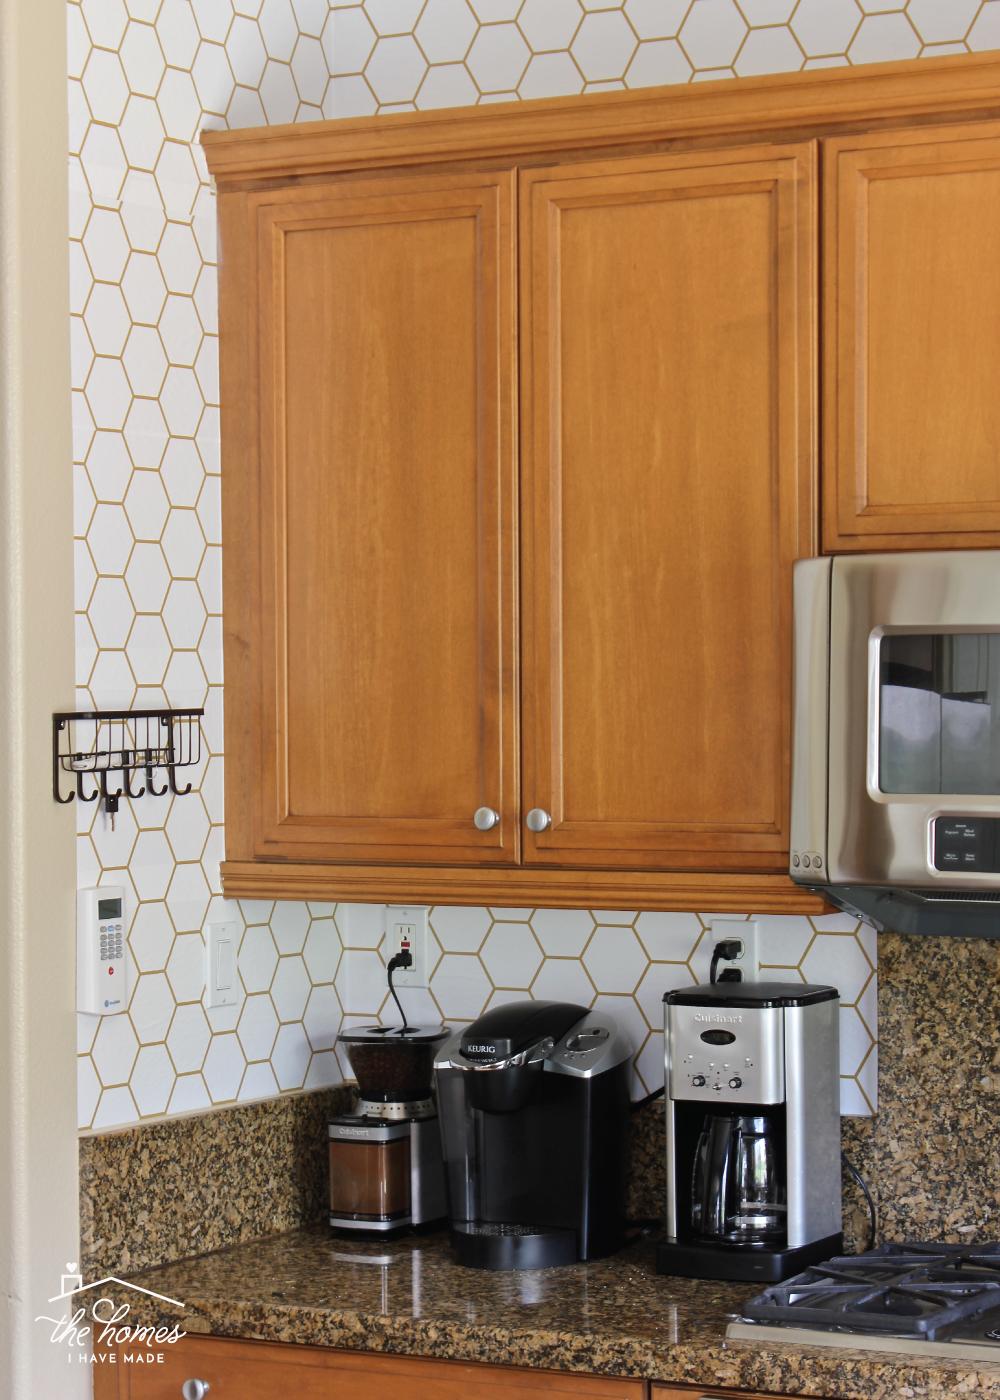 Adding Pattern To Your Kitchen Backsplash Doesn T Have Stop The Tile With Kitchen Backsplash 1000x1400 Wallpaper Teahub Io